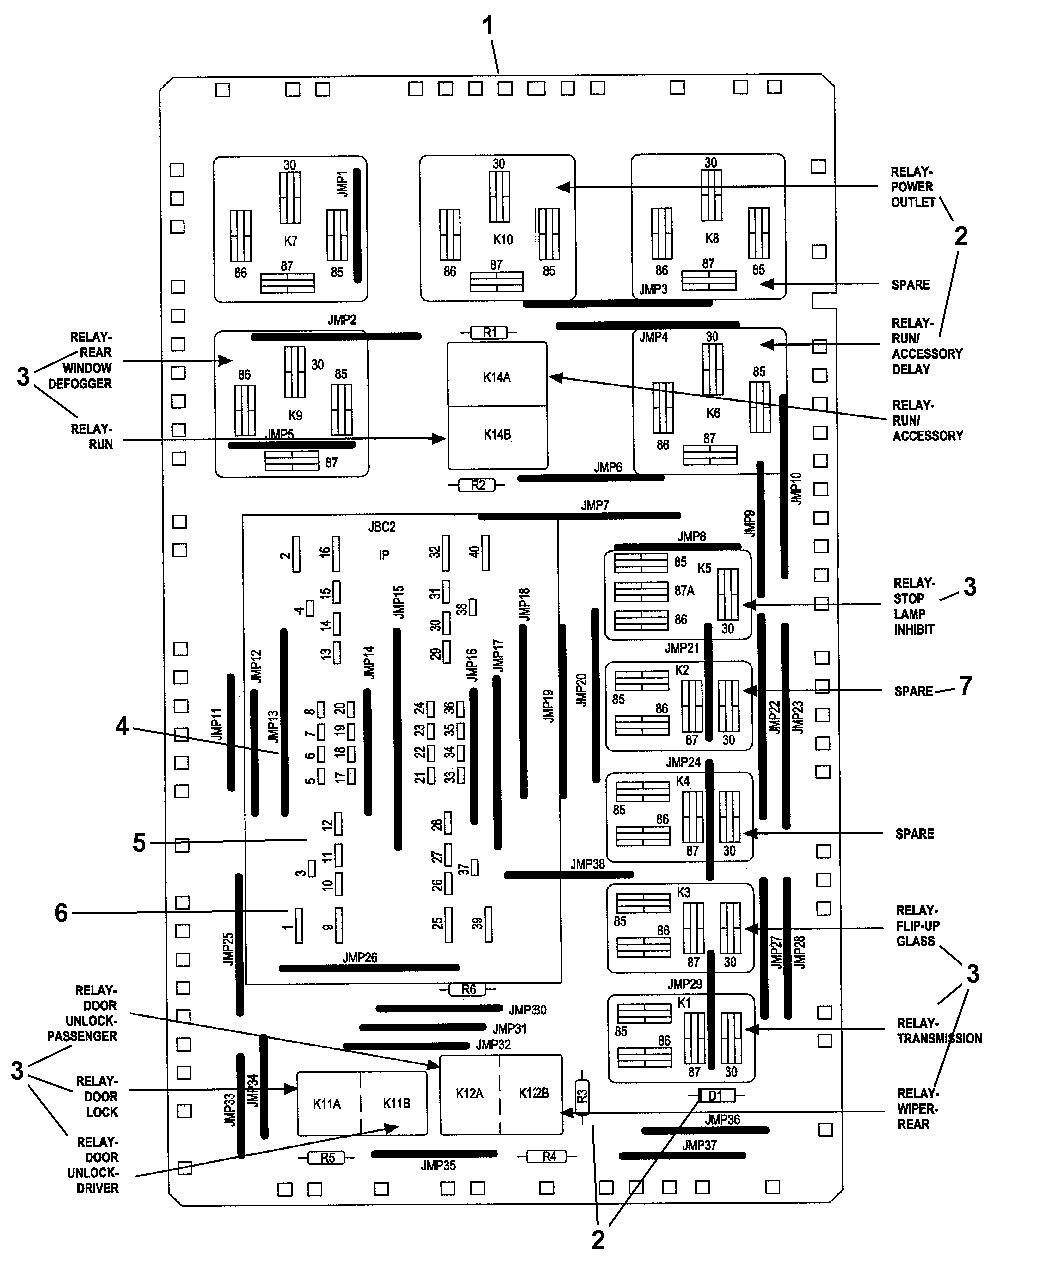 wk hemi engine compartment diagram wiring library rh 96 radiodiariodelhuila co